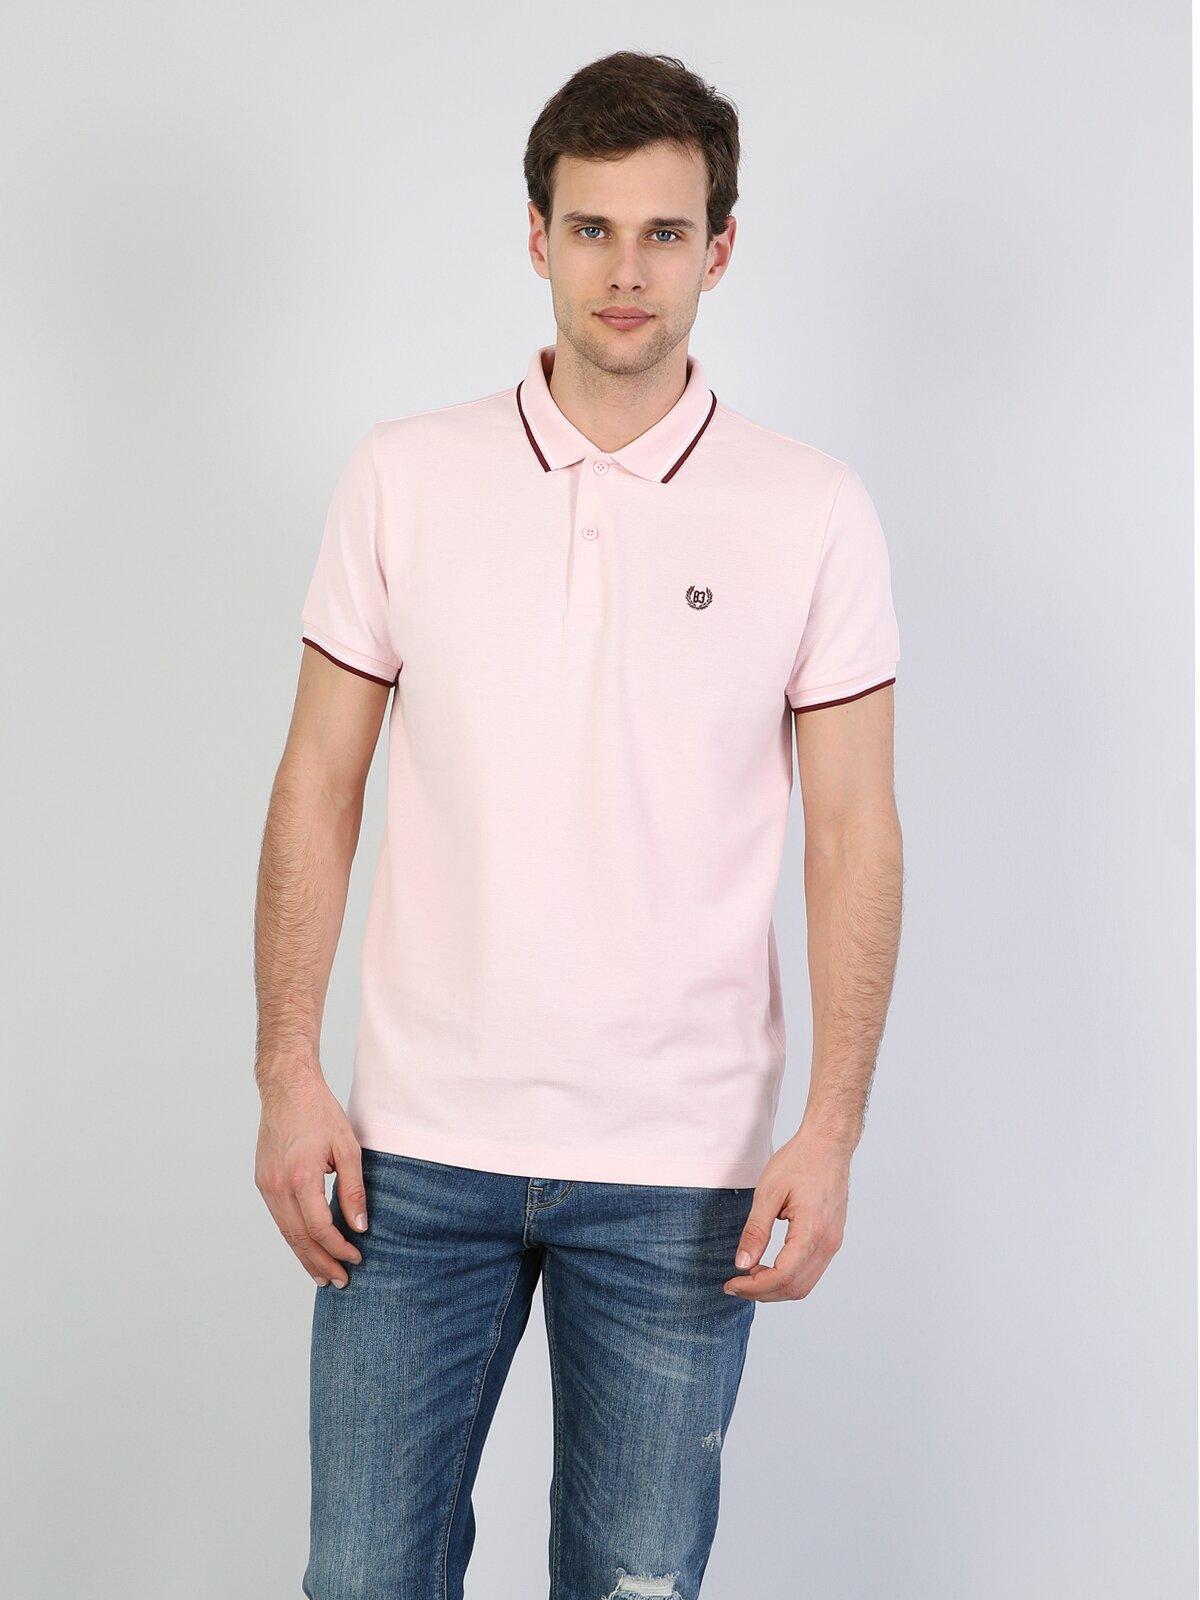 Polo Yaka Pembe Erkek Kısa Kol Tişört